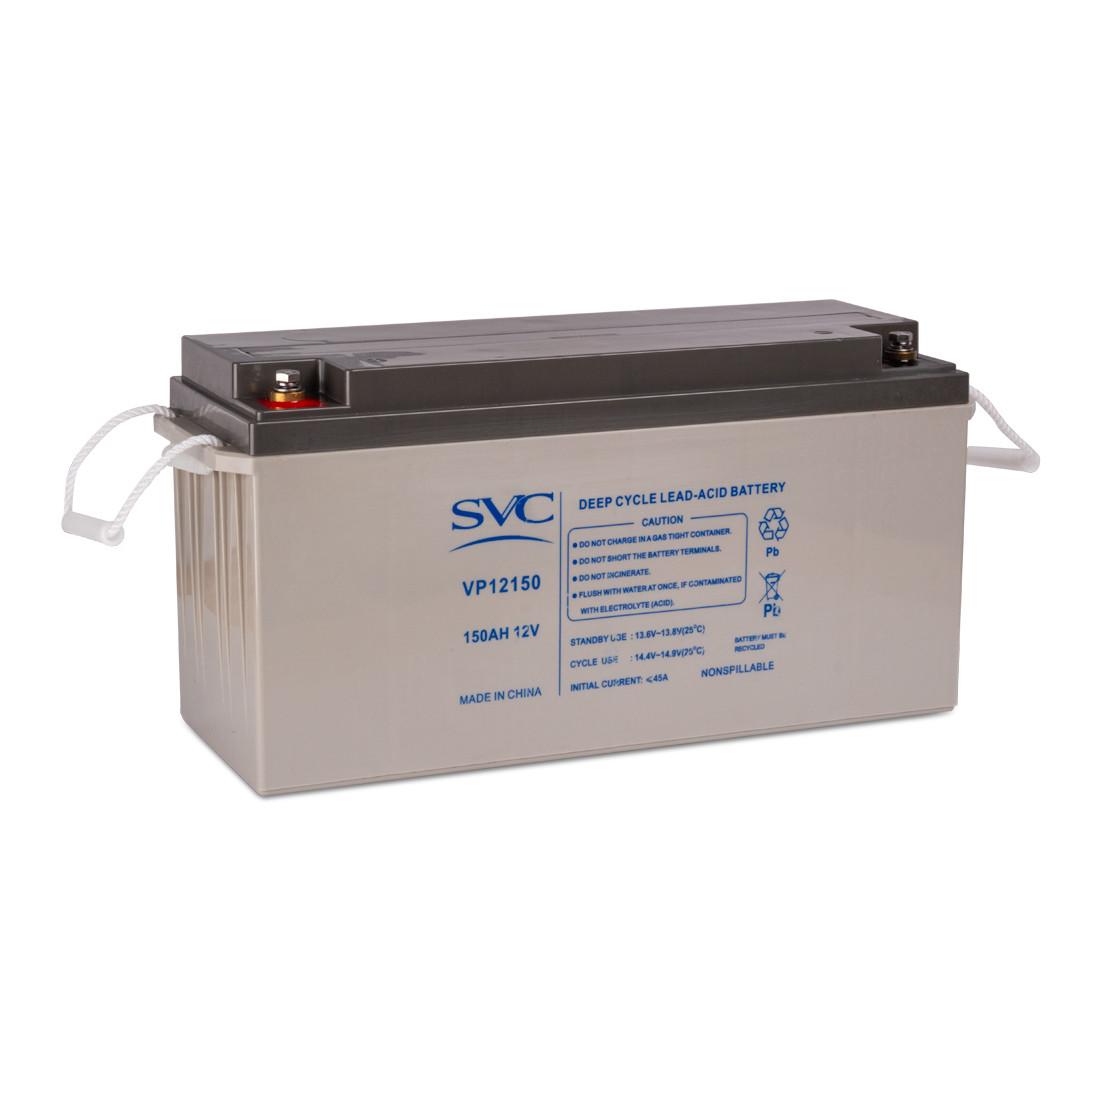 Батарея SVC свинцово-кислотная VP12150 12В 150 Ач